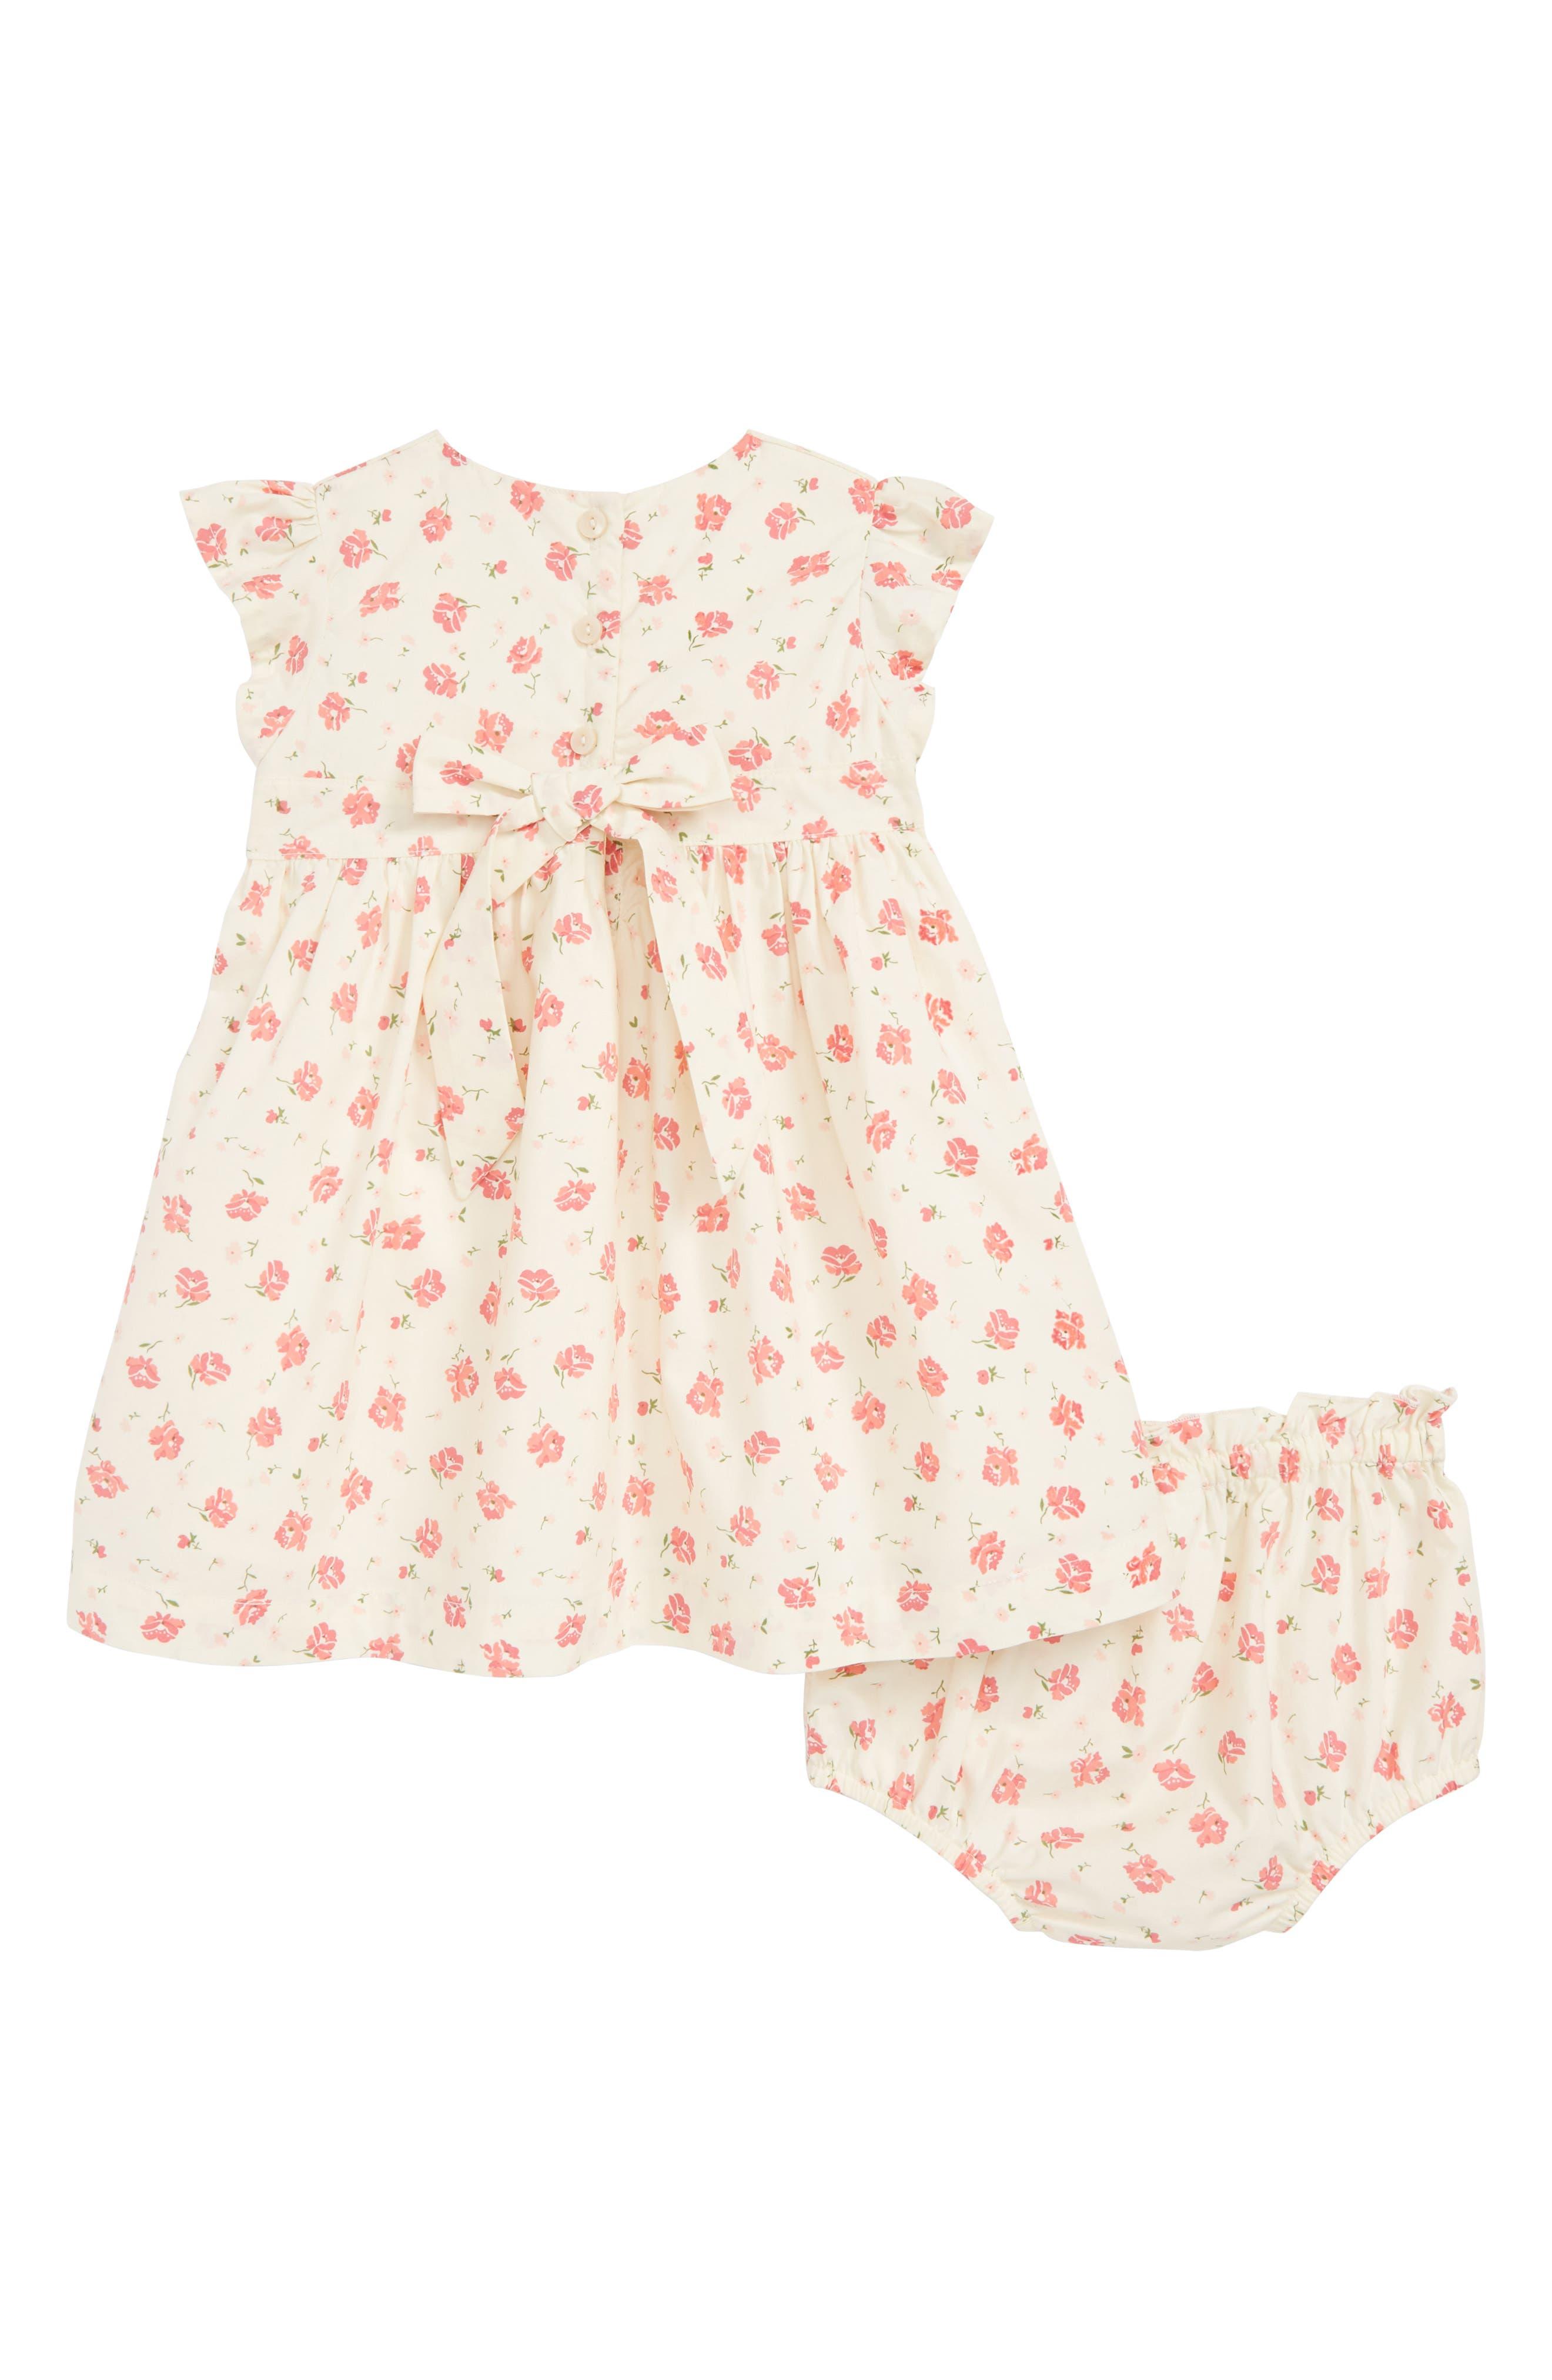 RUBY & BLOOM, Lily Print Smocked Dress, Alternate thumbnail 2, color, IVORY EGRET CASCADE FLORAL